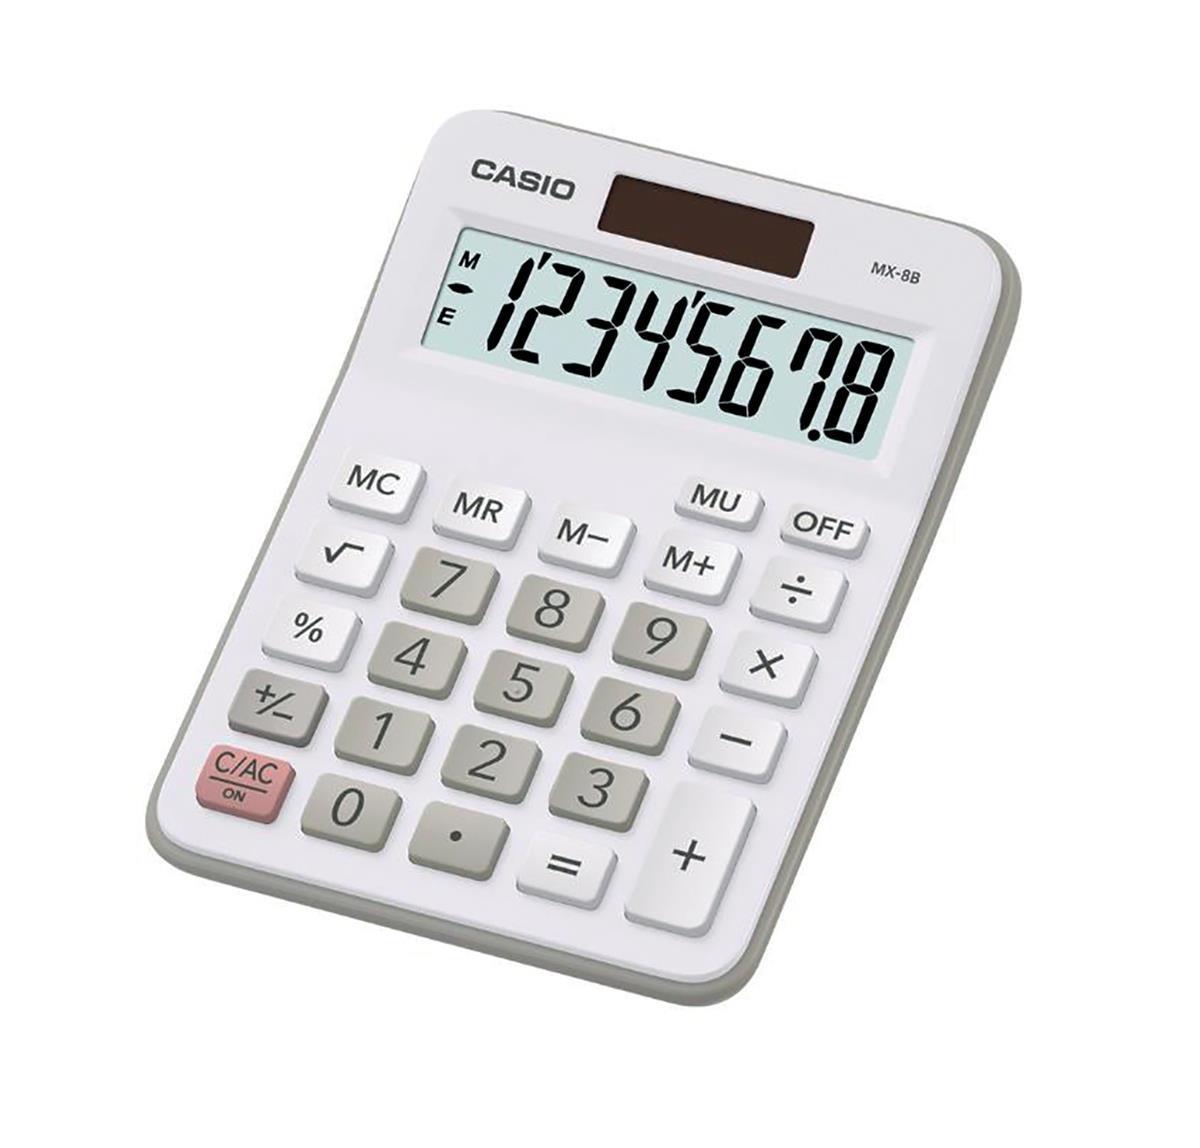 Handheld, Printing & Scientific Calculators